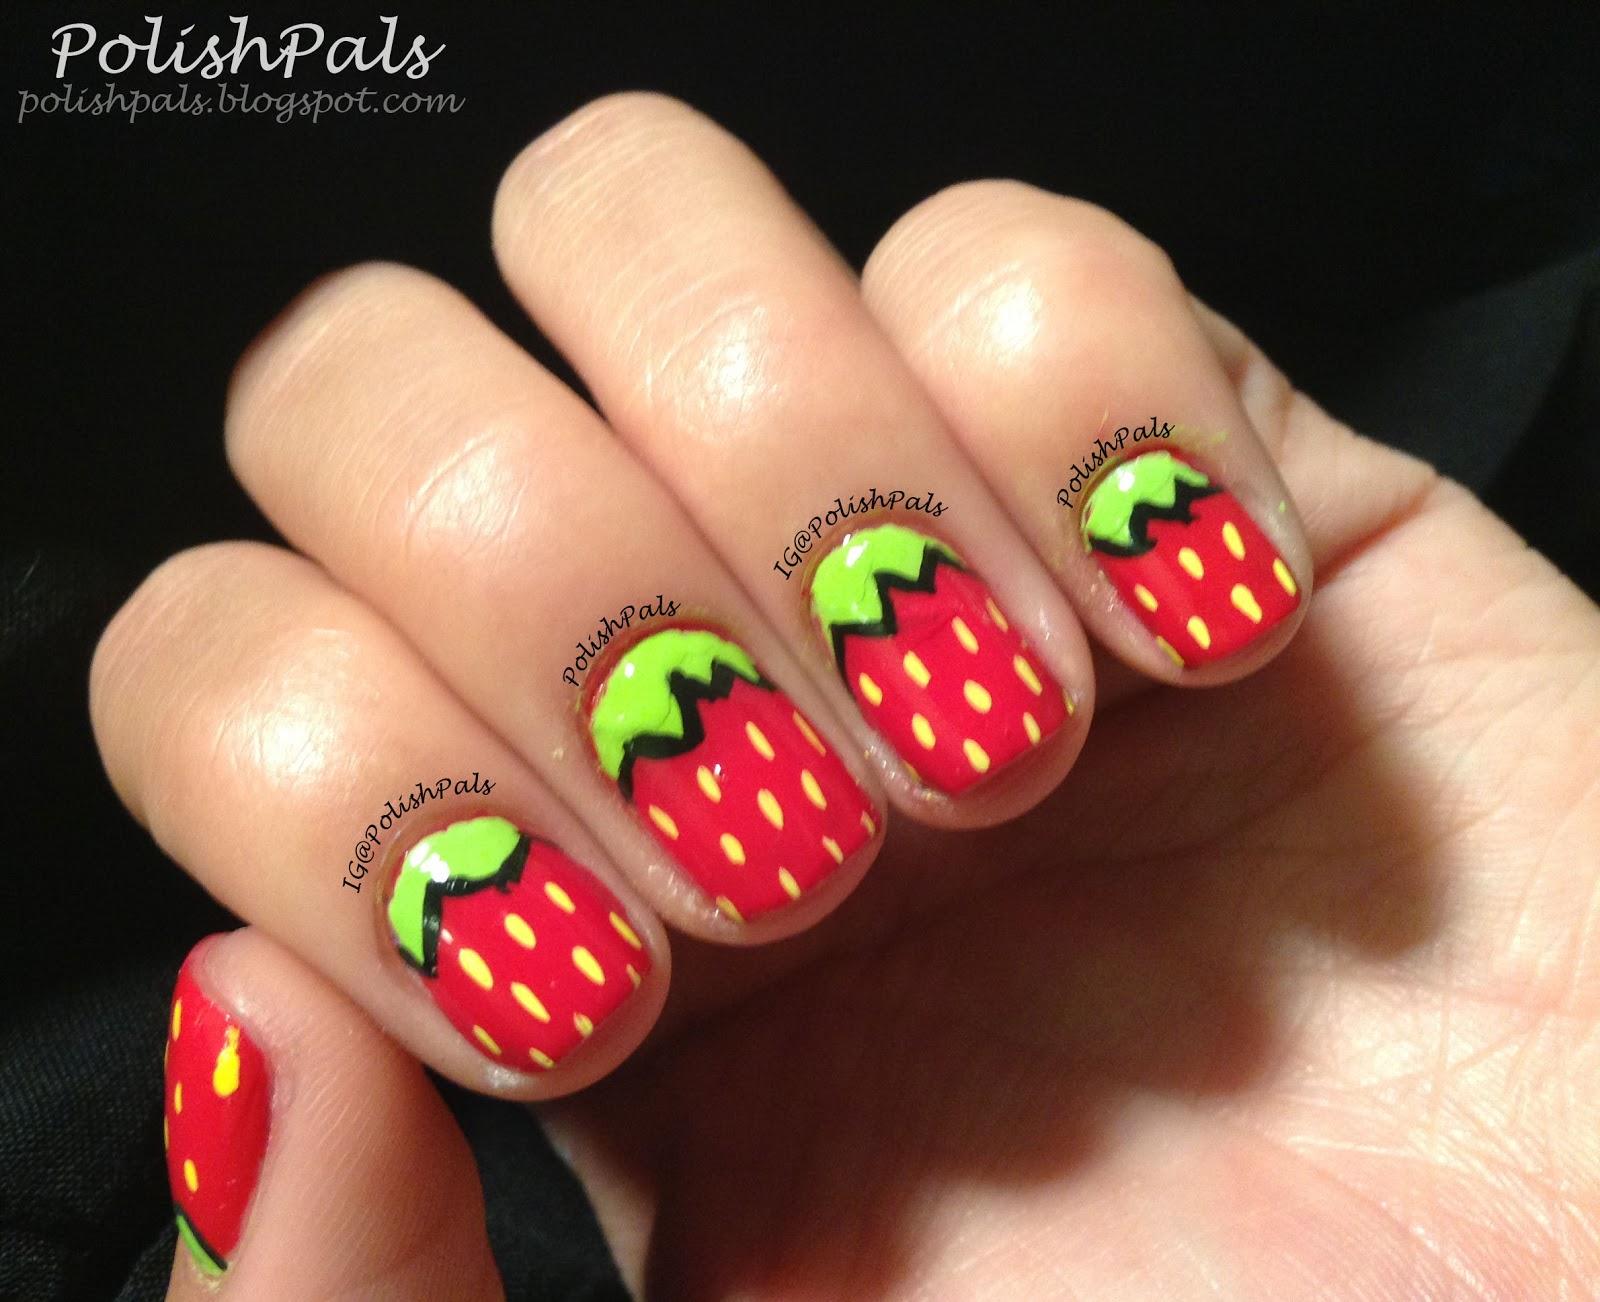 Polish pals strawberry nail art tutorial strawberry nail art tutorial prinsesfo Images